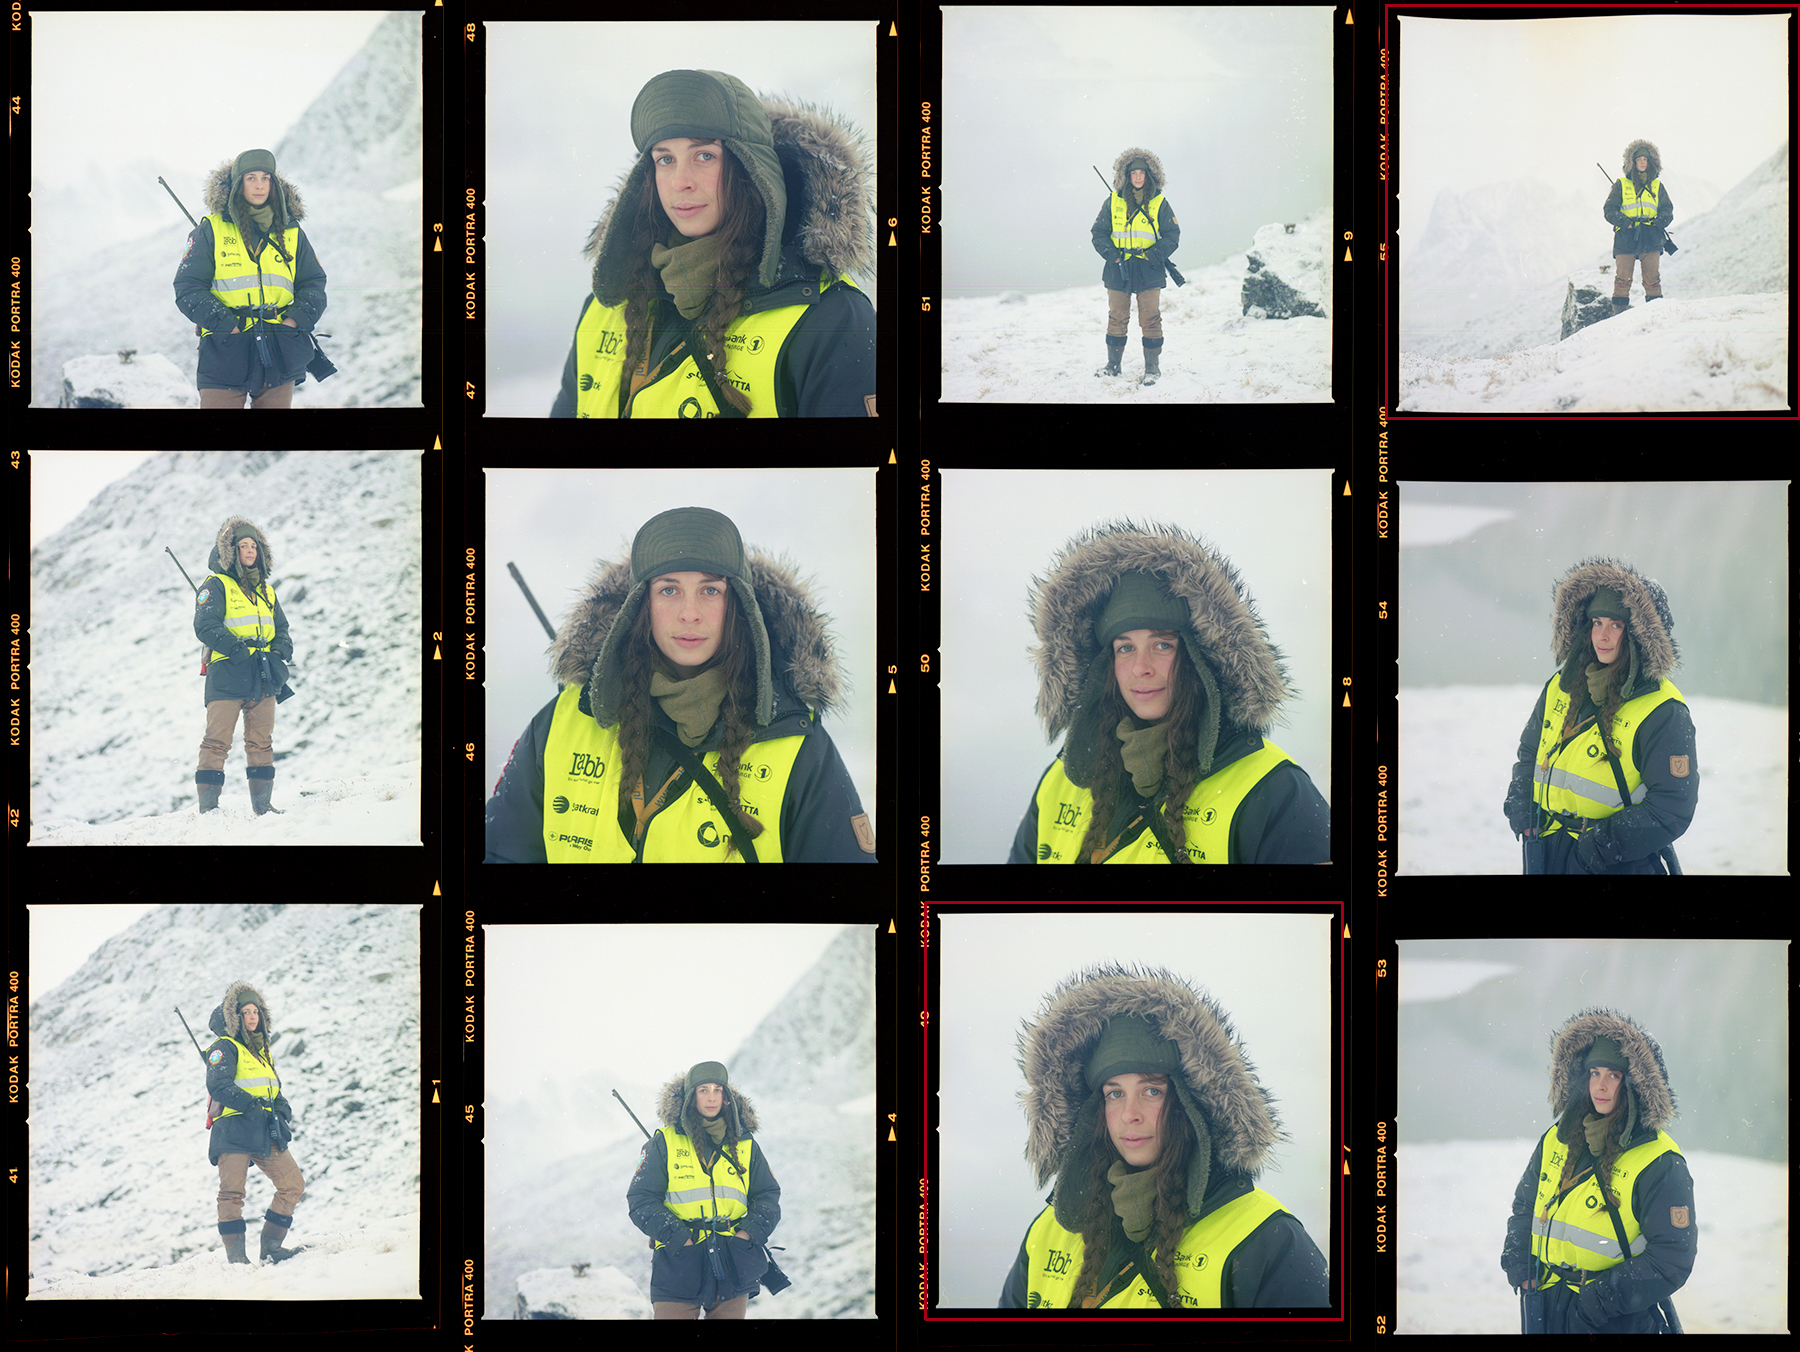 Kristin Kristin Jæger Wexsahl, Guide, Arctic Circle Residency , Magdalenafjord, Svalbard Norway. Guide, Arctic Circle Residency. Photographs © Shoshannah White 2015